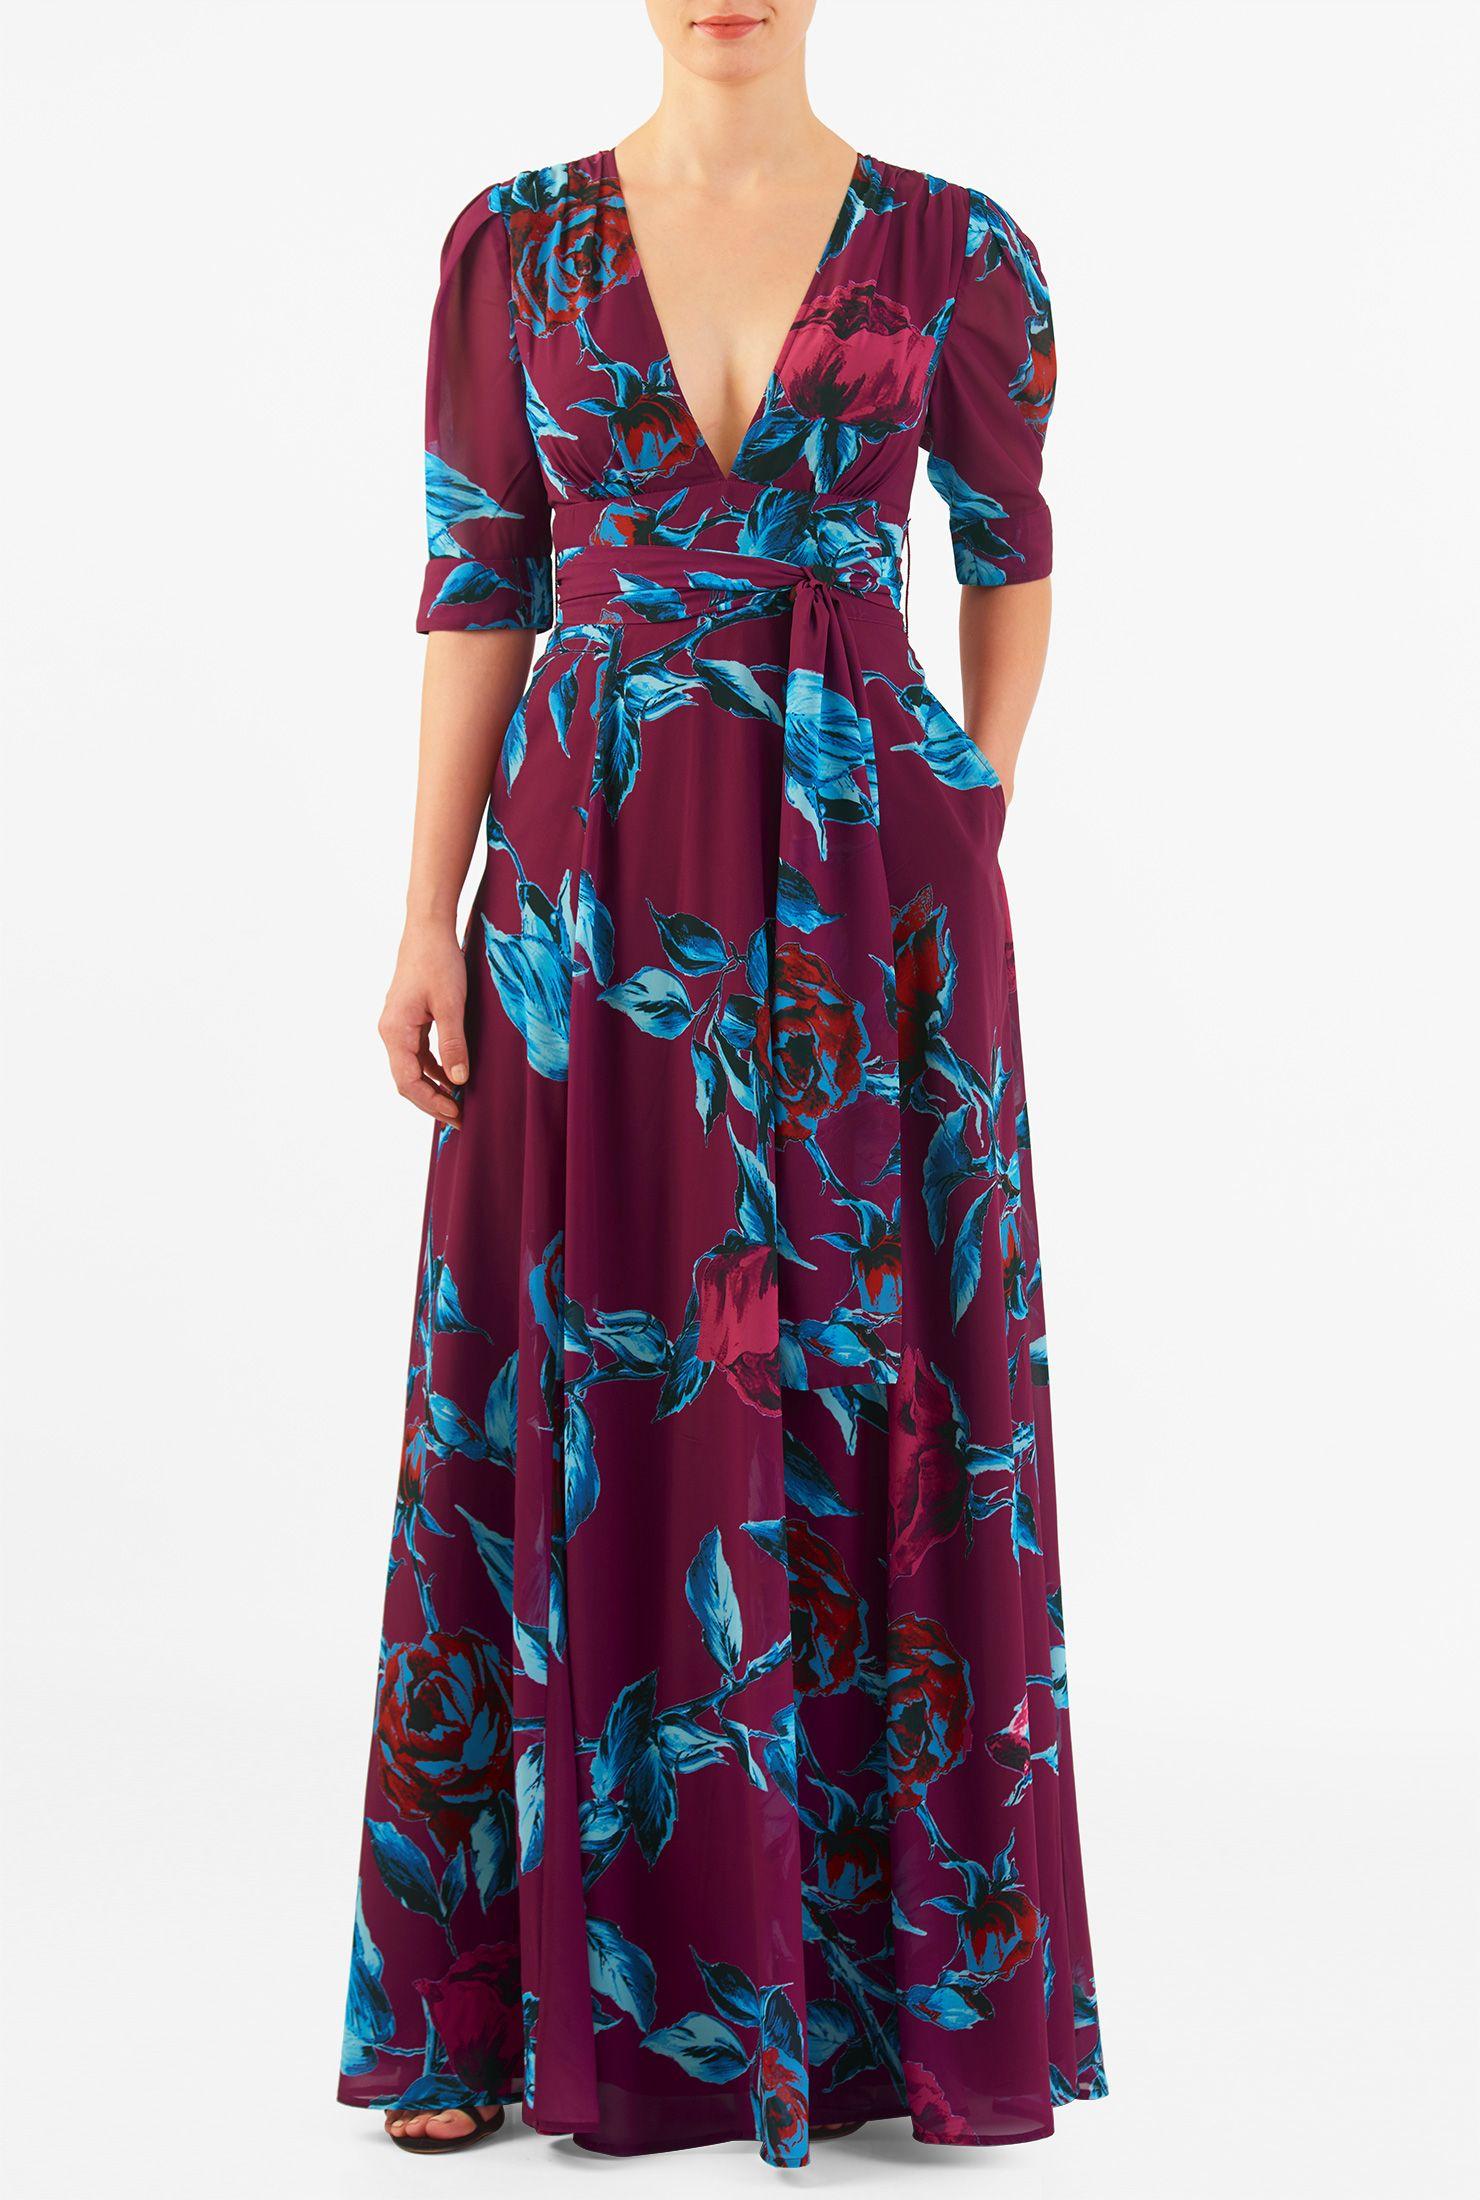 b435f0f774a Plus Size Maxi Dresses for Women